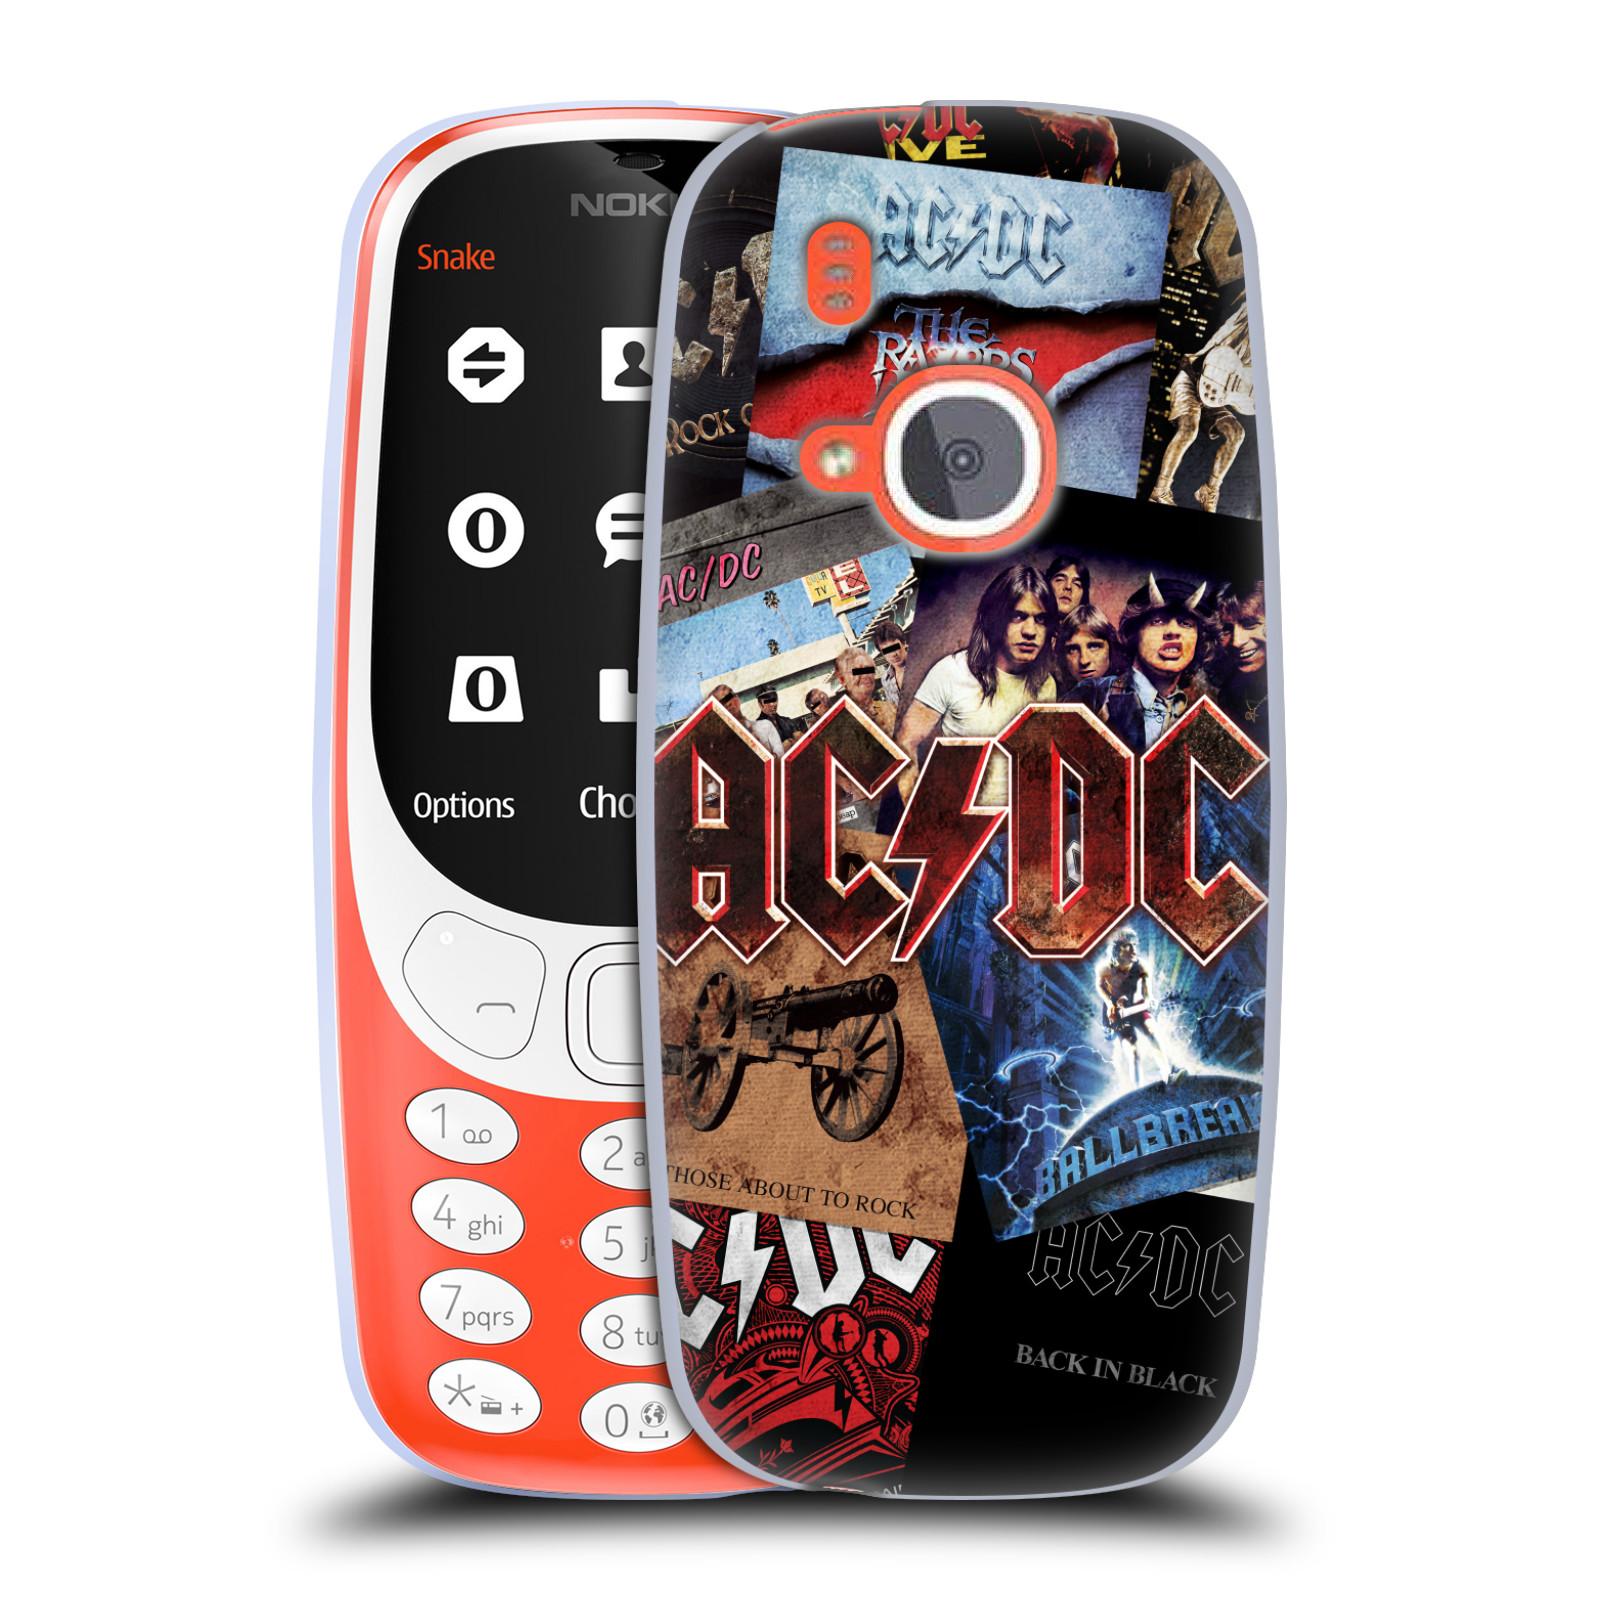 Silikonové pouzdro na mobil Nokia 3310 - Head Case - AC/DC Koláž desek